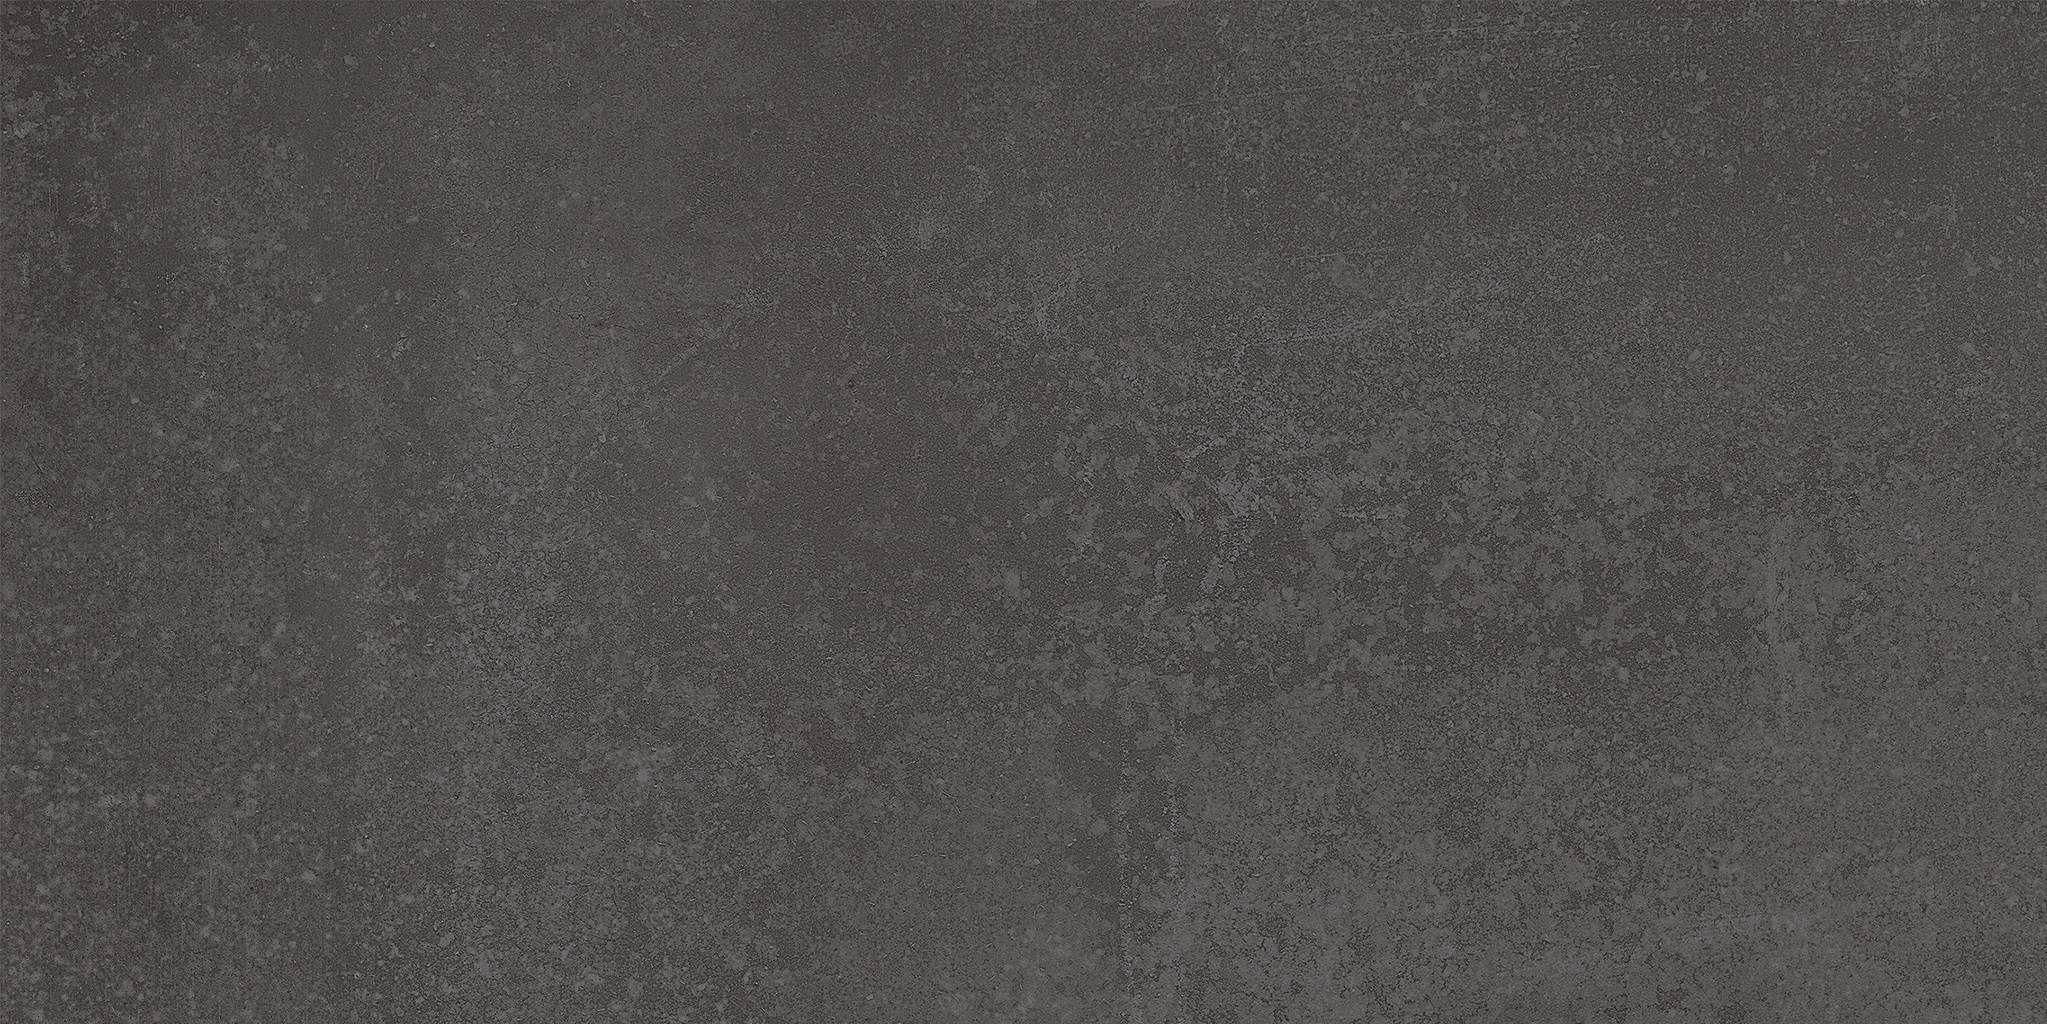 Betonlook tegel Antraciet 30x60cm (Keramiek)